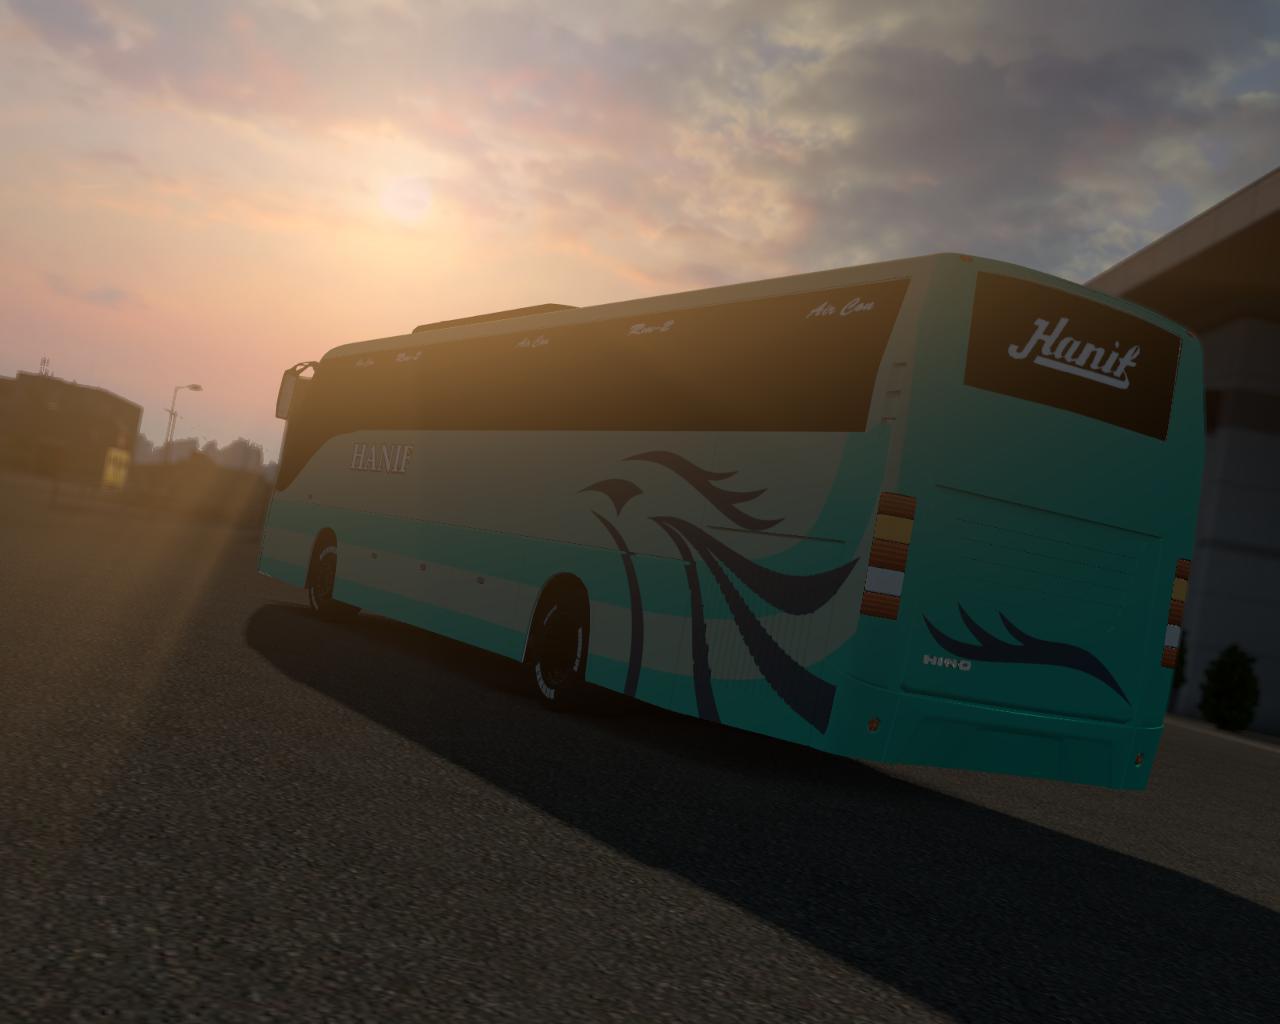 ETS2 - Hino RM2 Bus Mod (1.36 - 1.37)